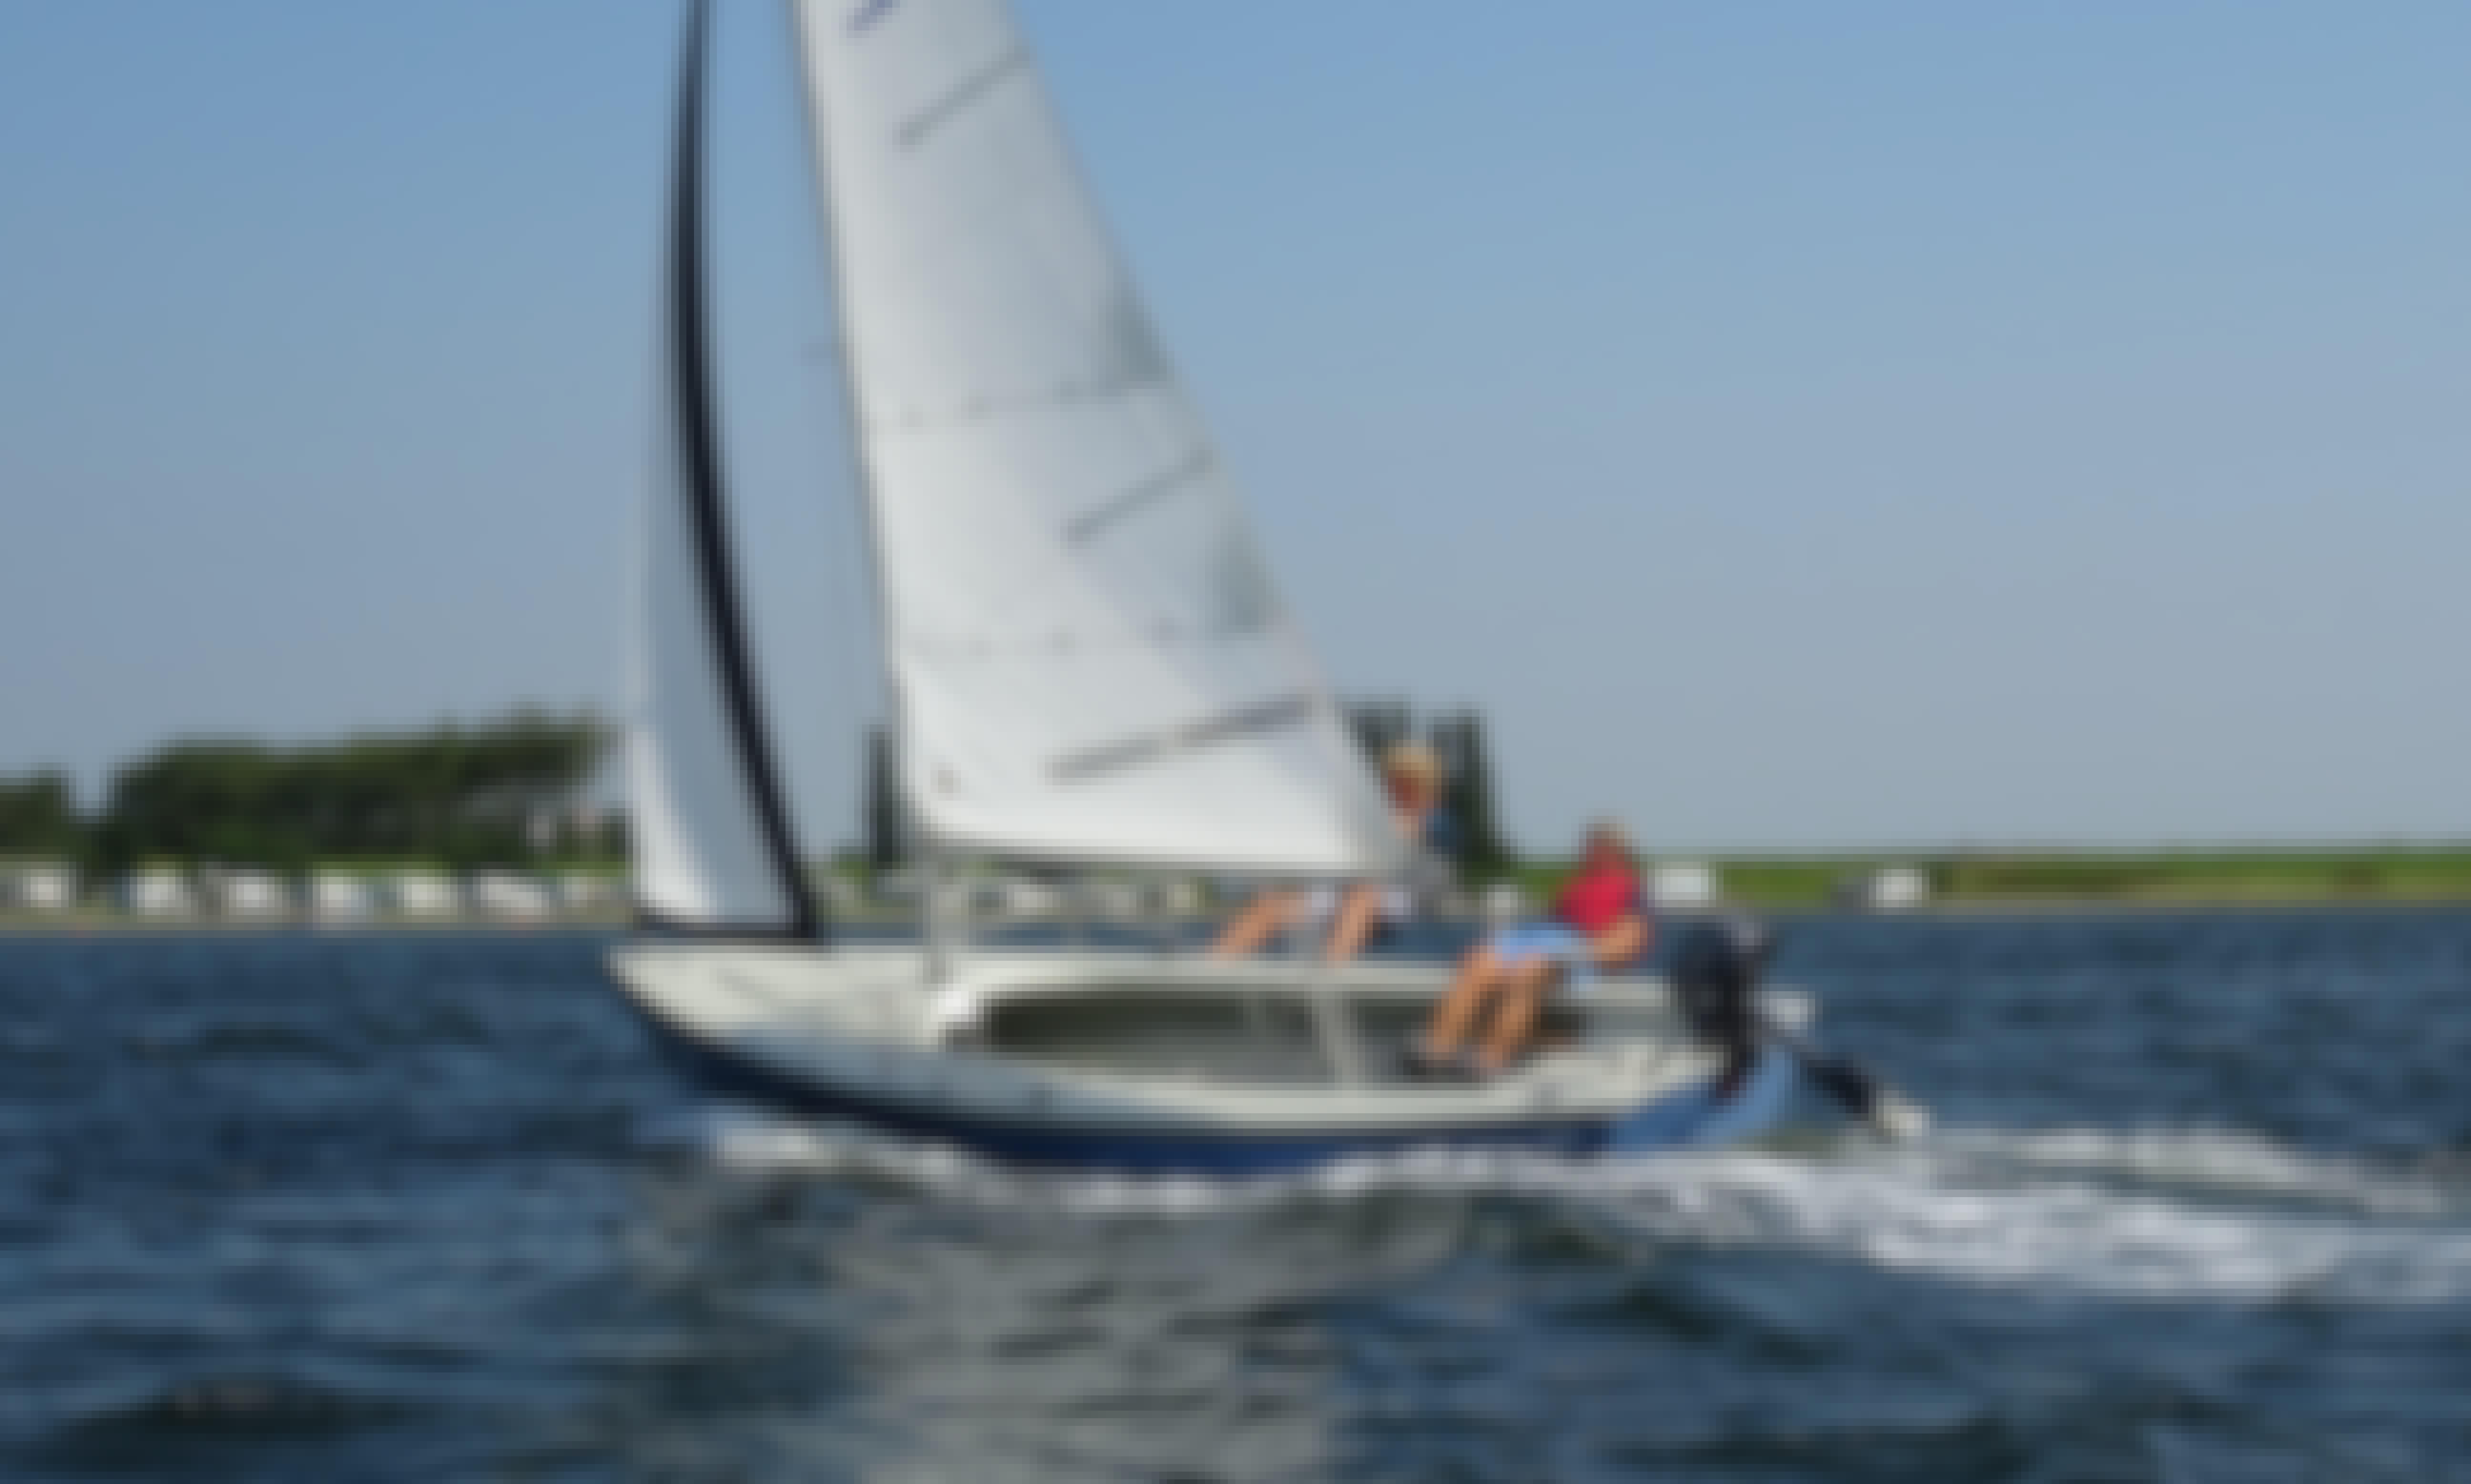 Sail the lake in Zeeland with this 22' Randmeer Sailboat